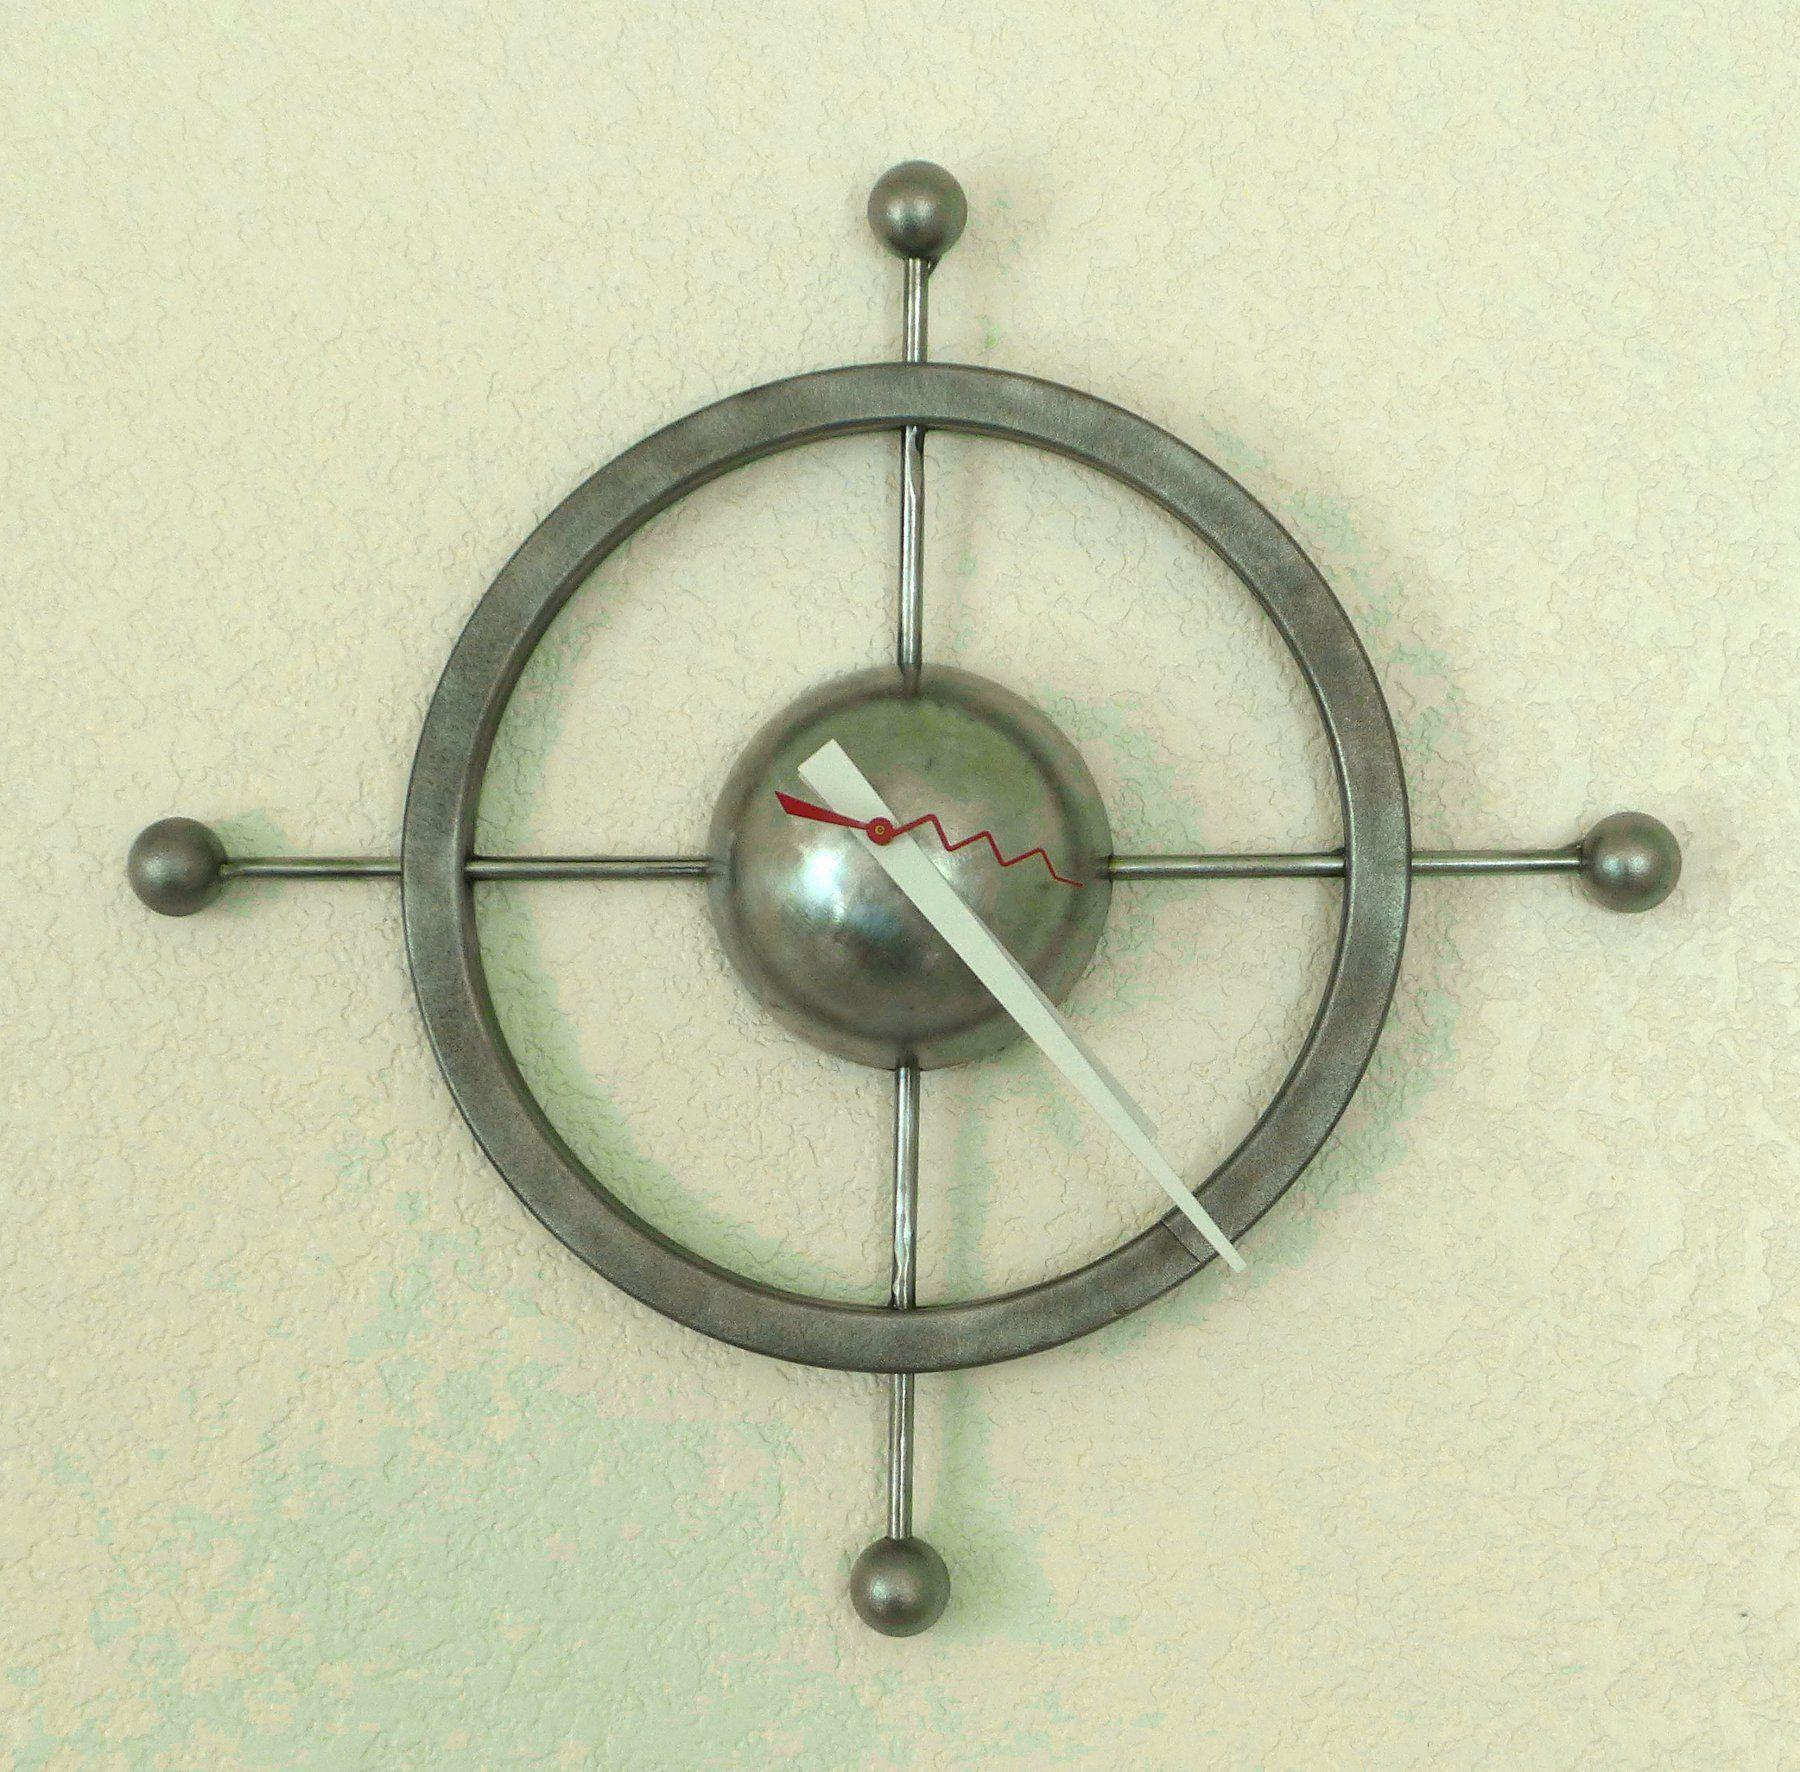 Orbit Handmade Wall Clock Metal Machine Age Steampunk Modern Design Pop Art Sculpture With Images Metal Wall Clock Original Art For Sale Clock